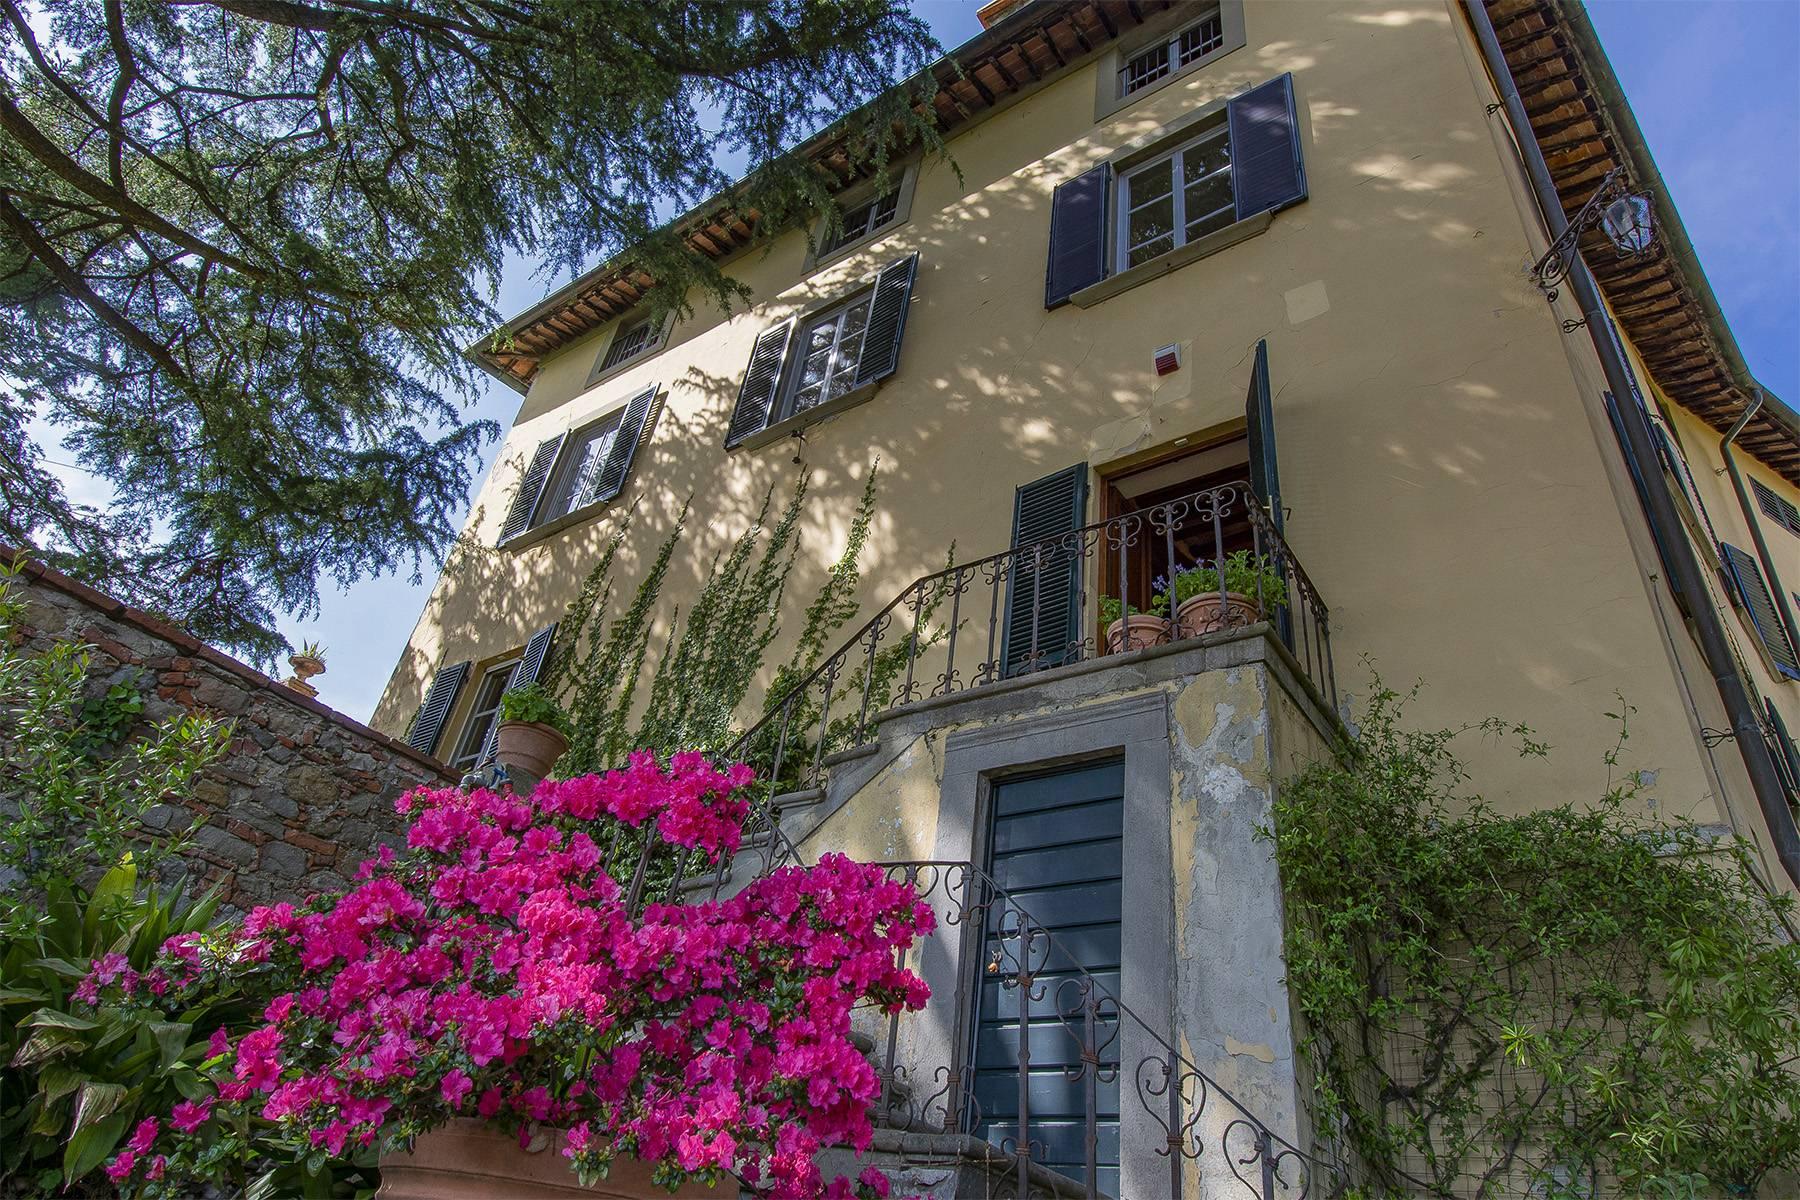 Villa in Vendita a Capannori: 5 locali, 380 mq - Foto 3